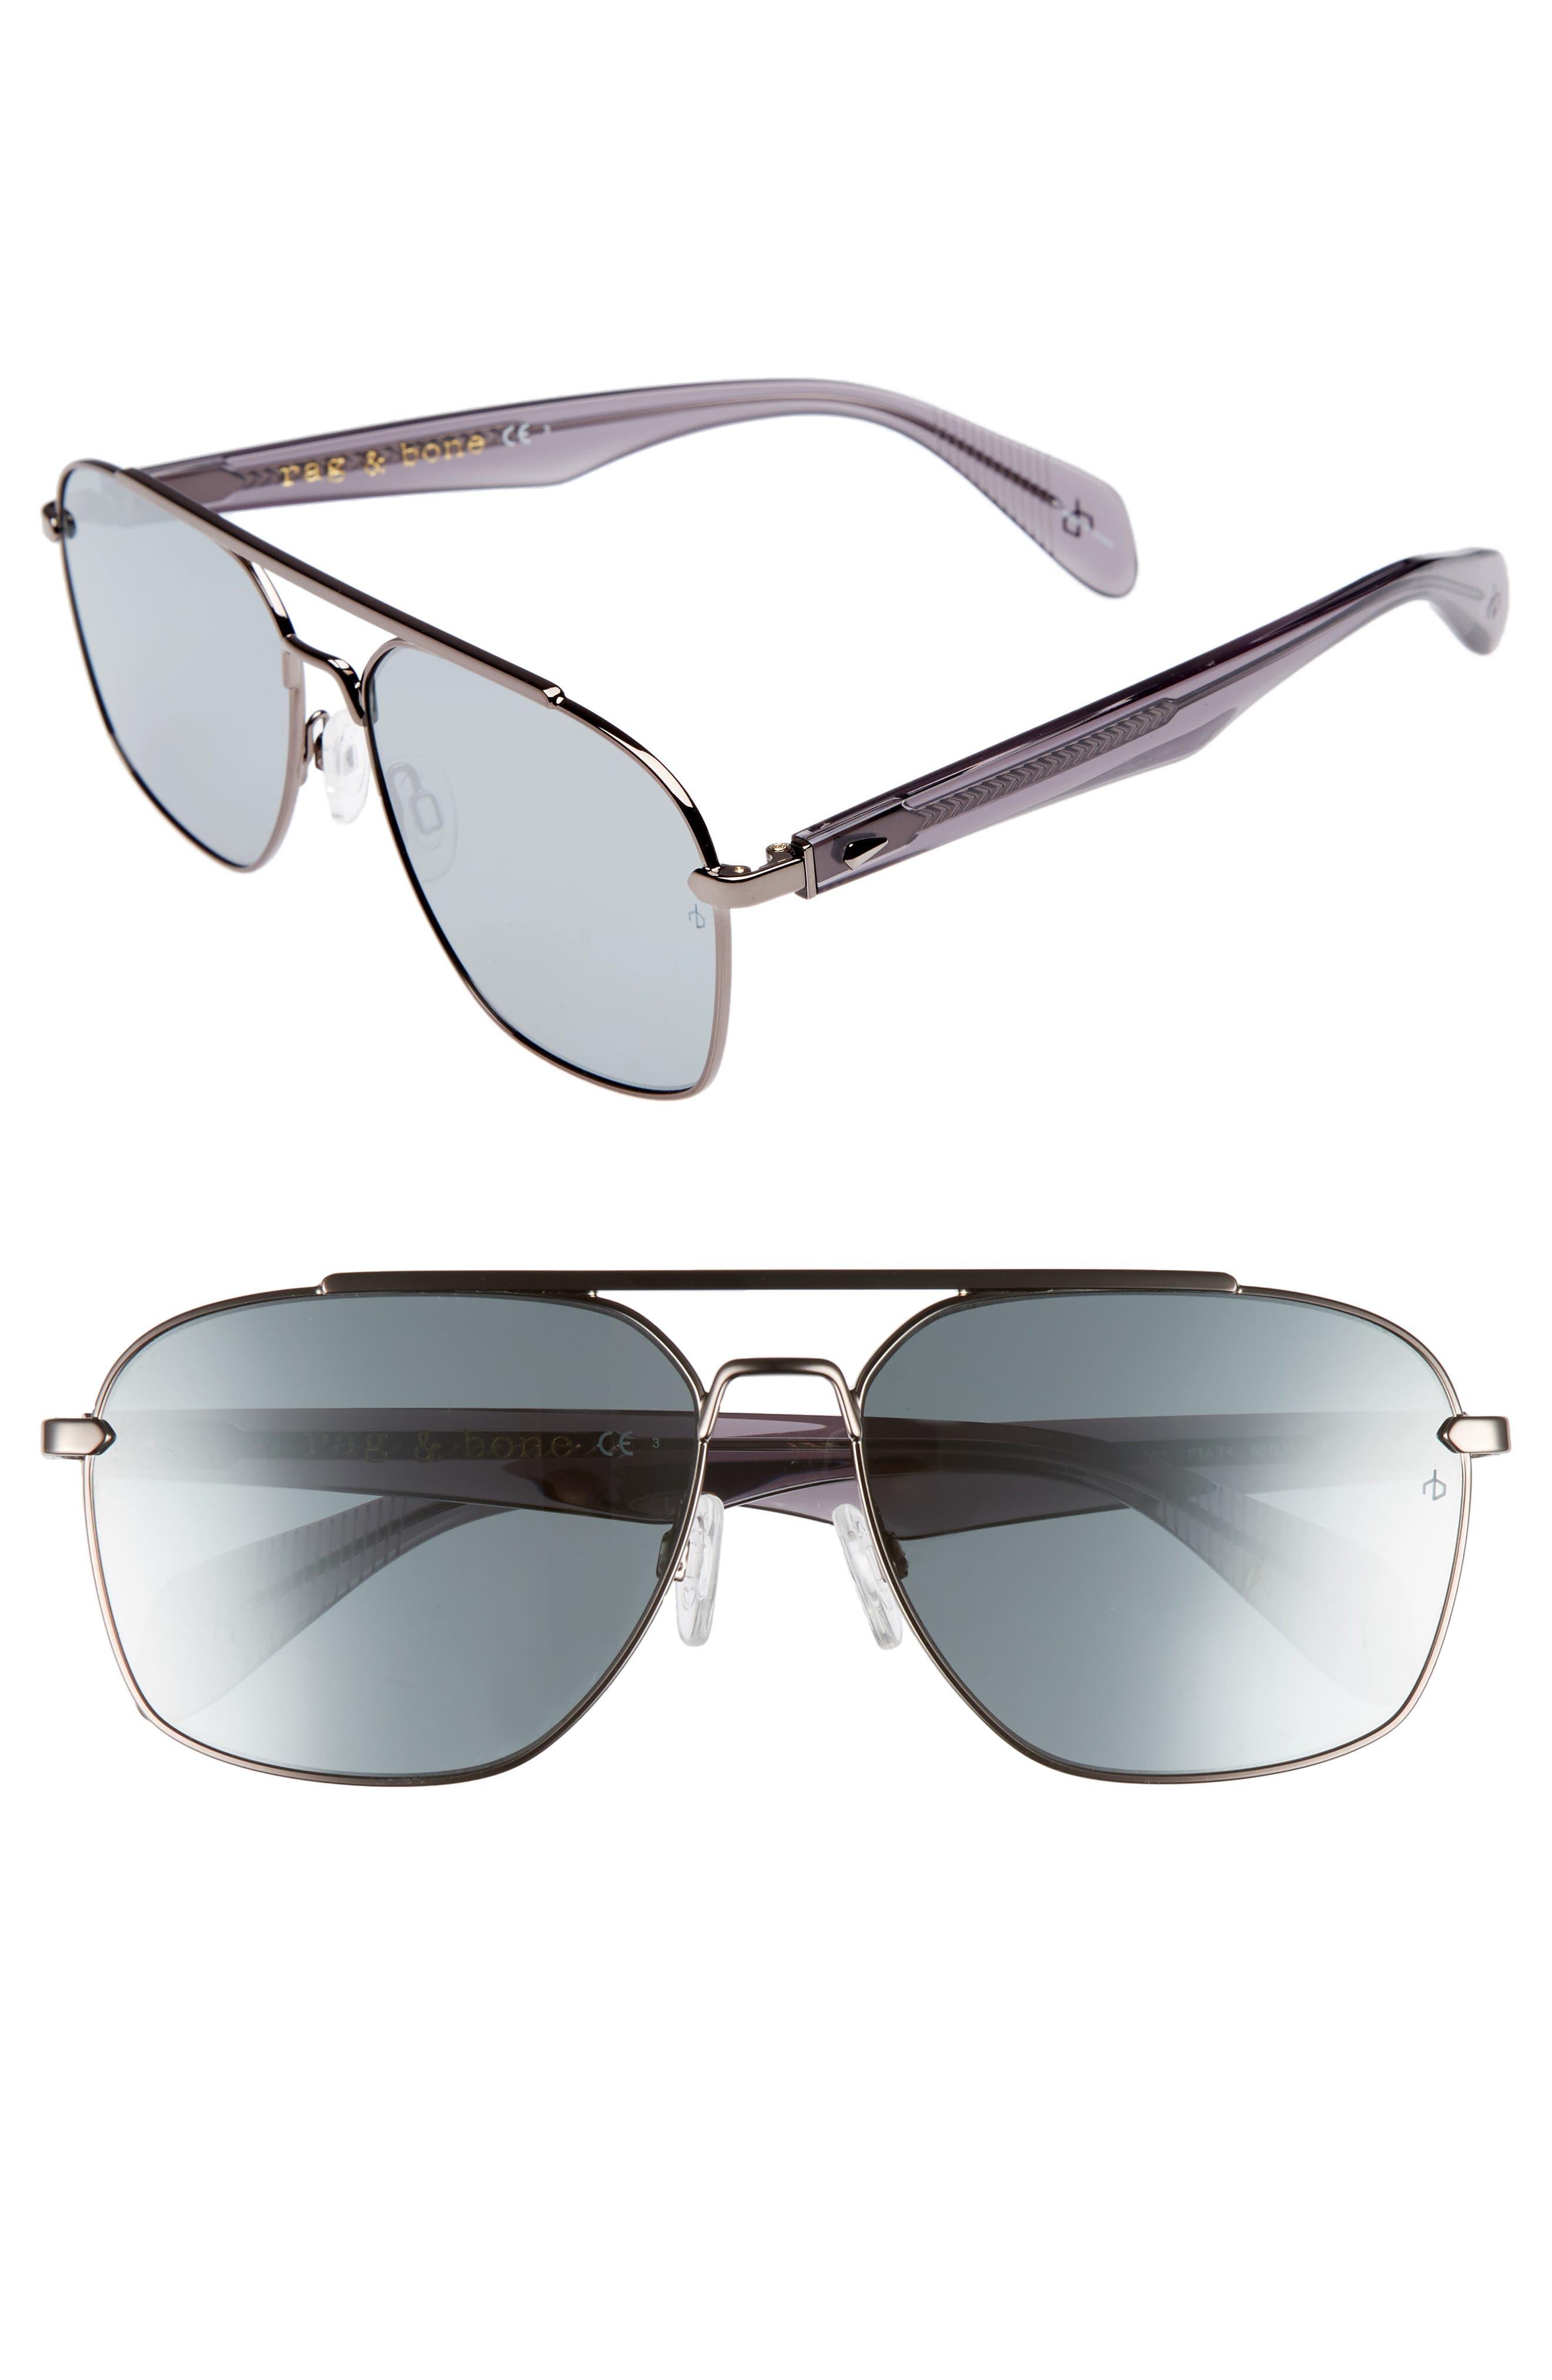 60mm Mirrored Navigator Sunglasses,                             Main thumbnail 1, color,                             Matte Ruthenium/ Grey